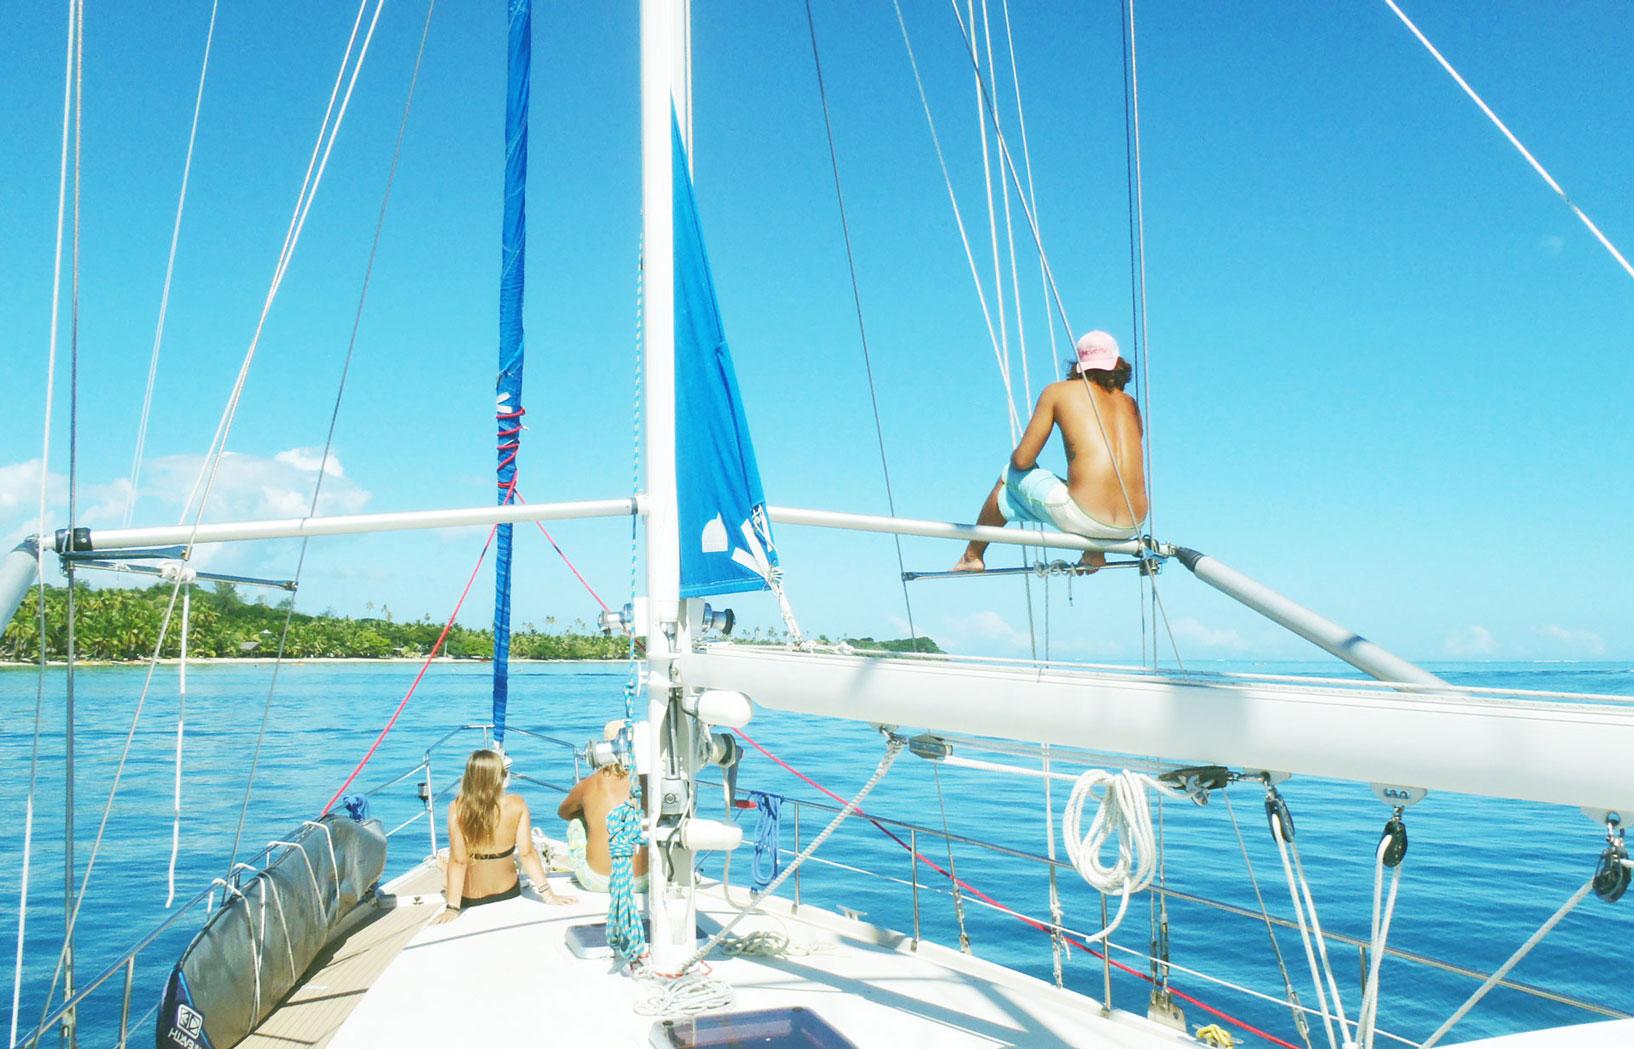 fiji / vanuatu / solomons     2011 - south pacific sailing